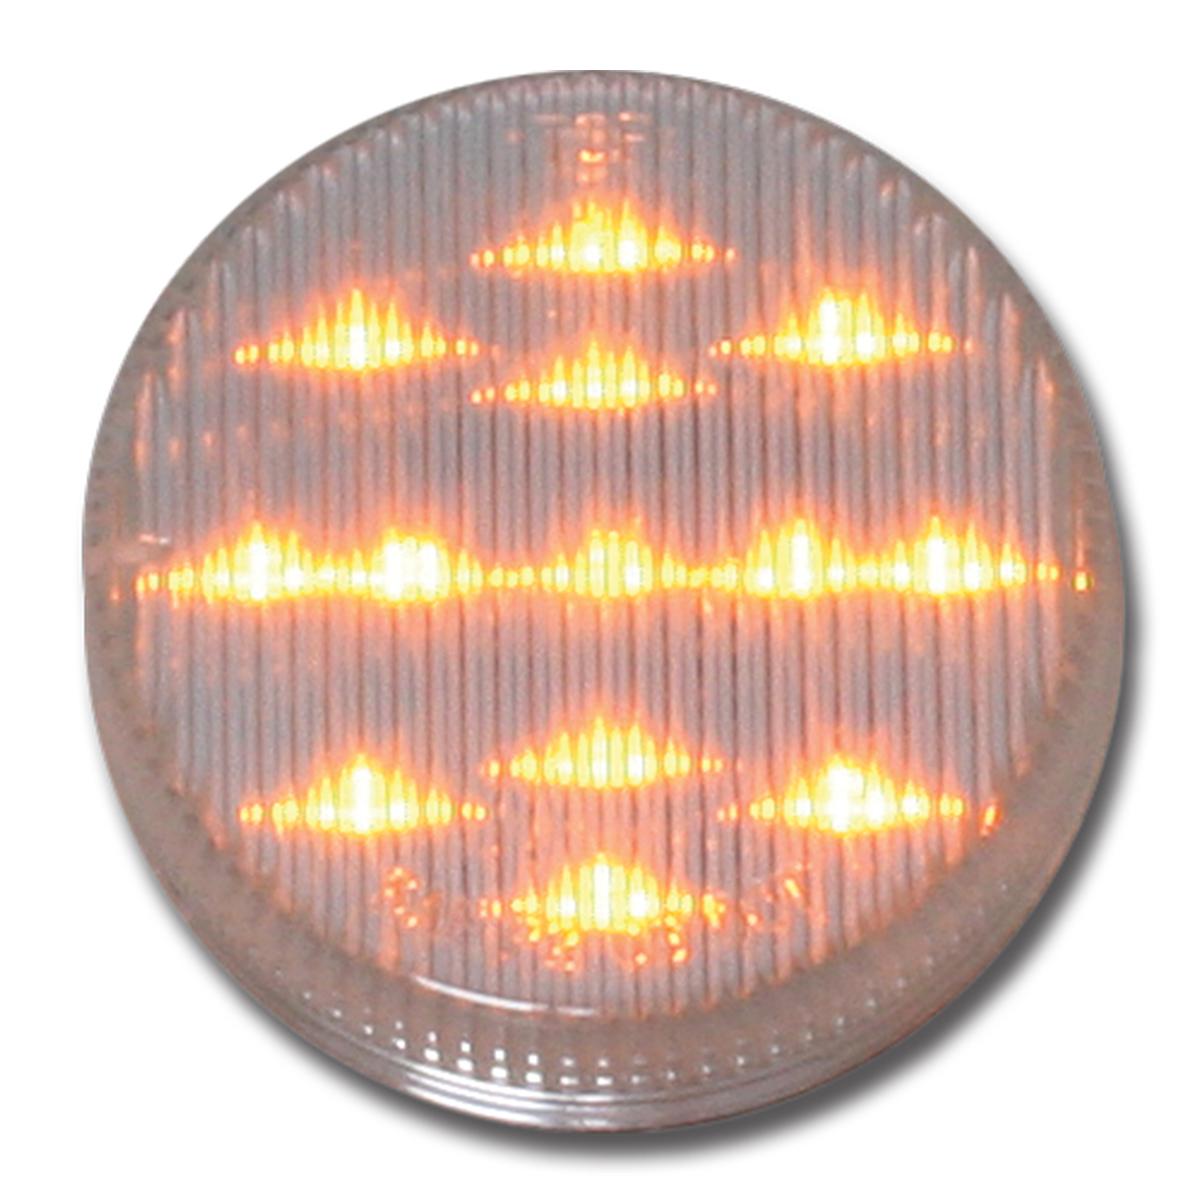 "79317 2-1/2"" Round Fleet Marker Light"